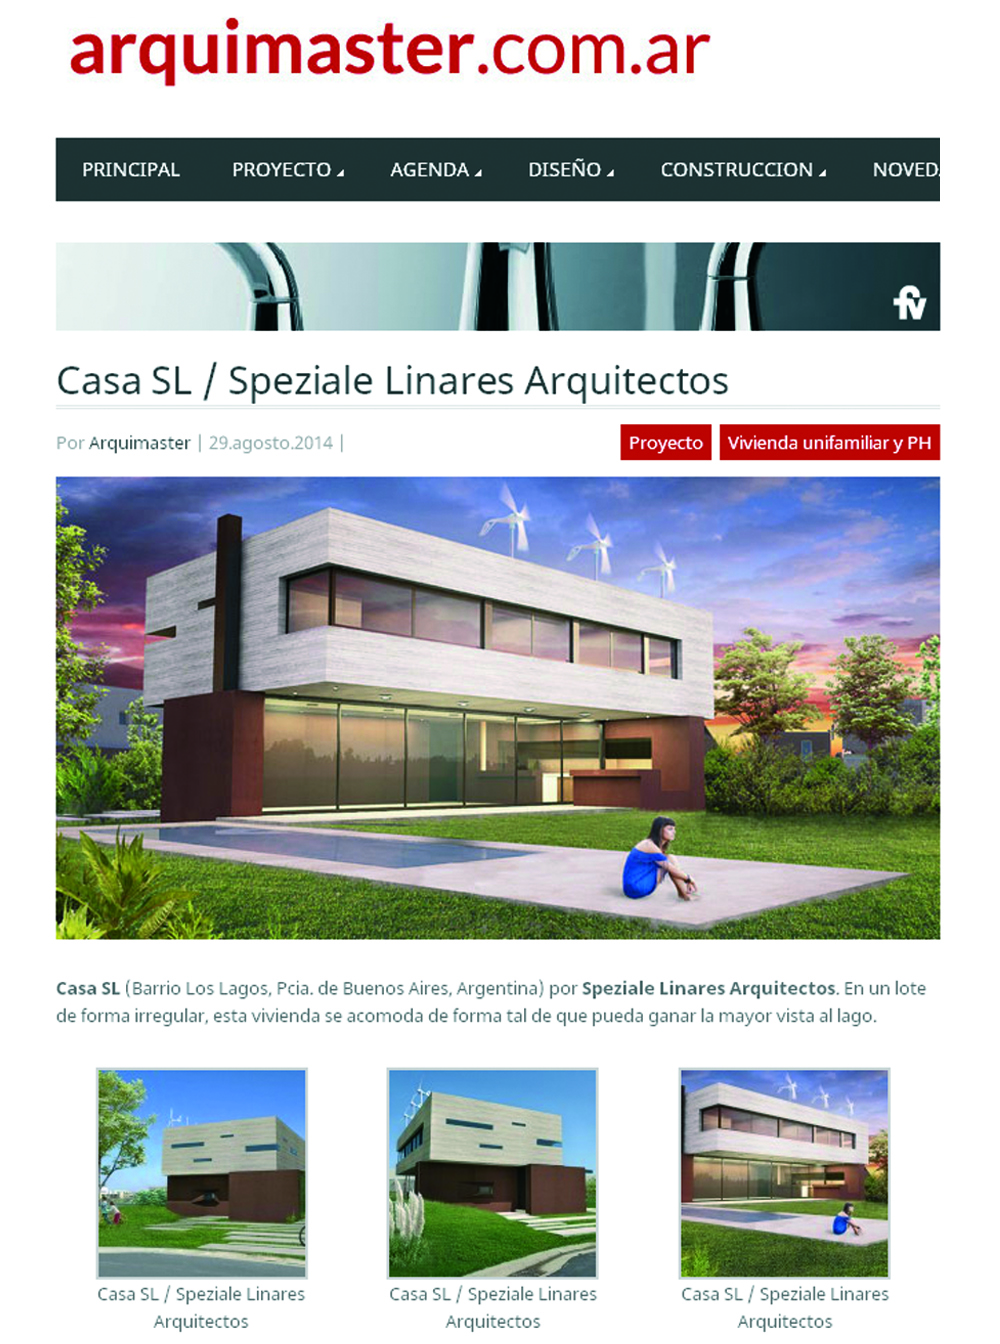 ARQUIMASTER - CASA SL